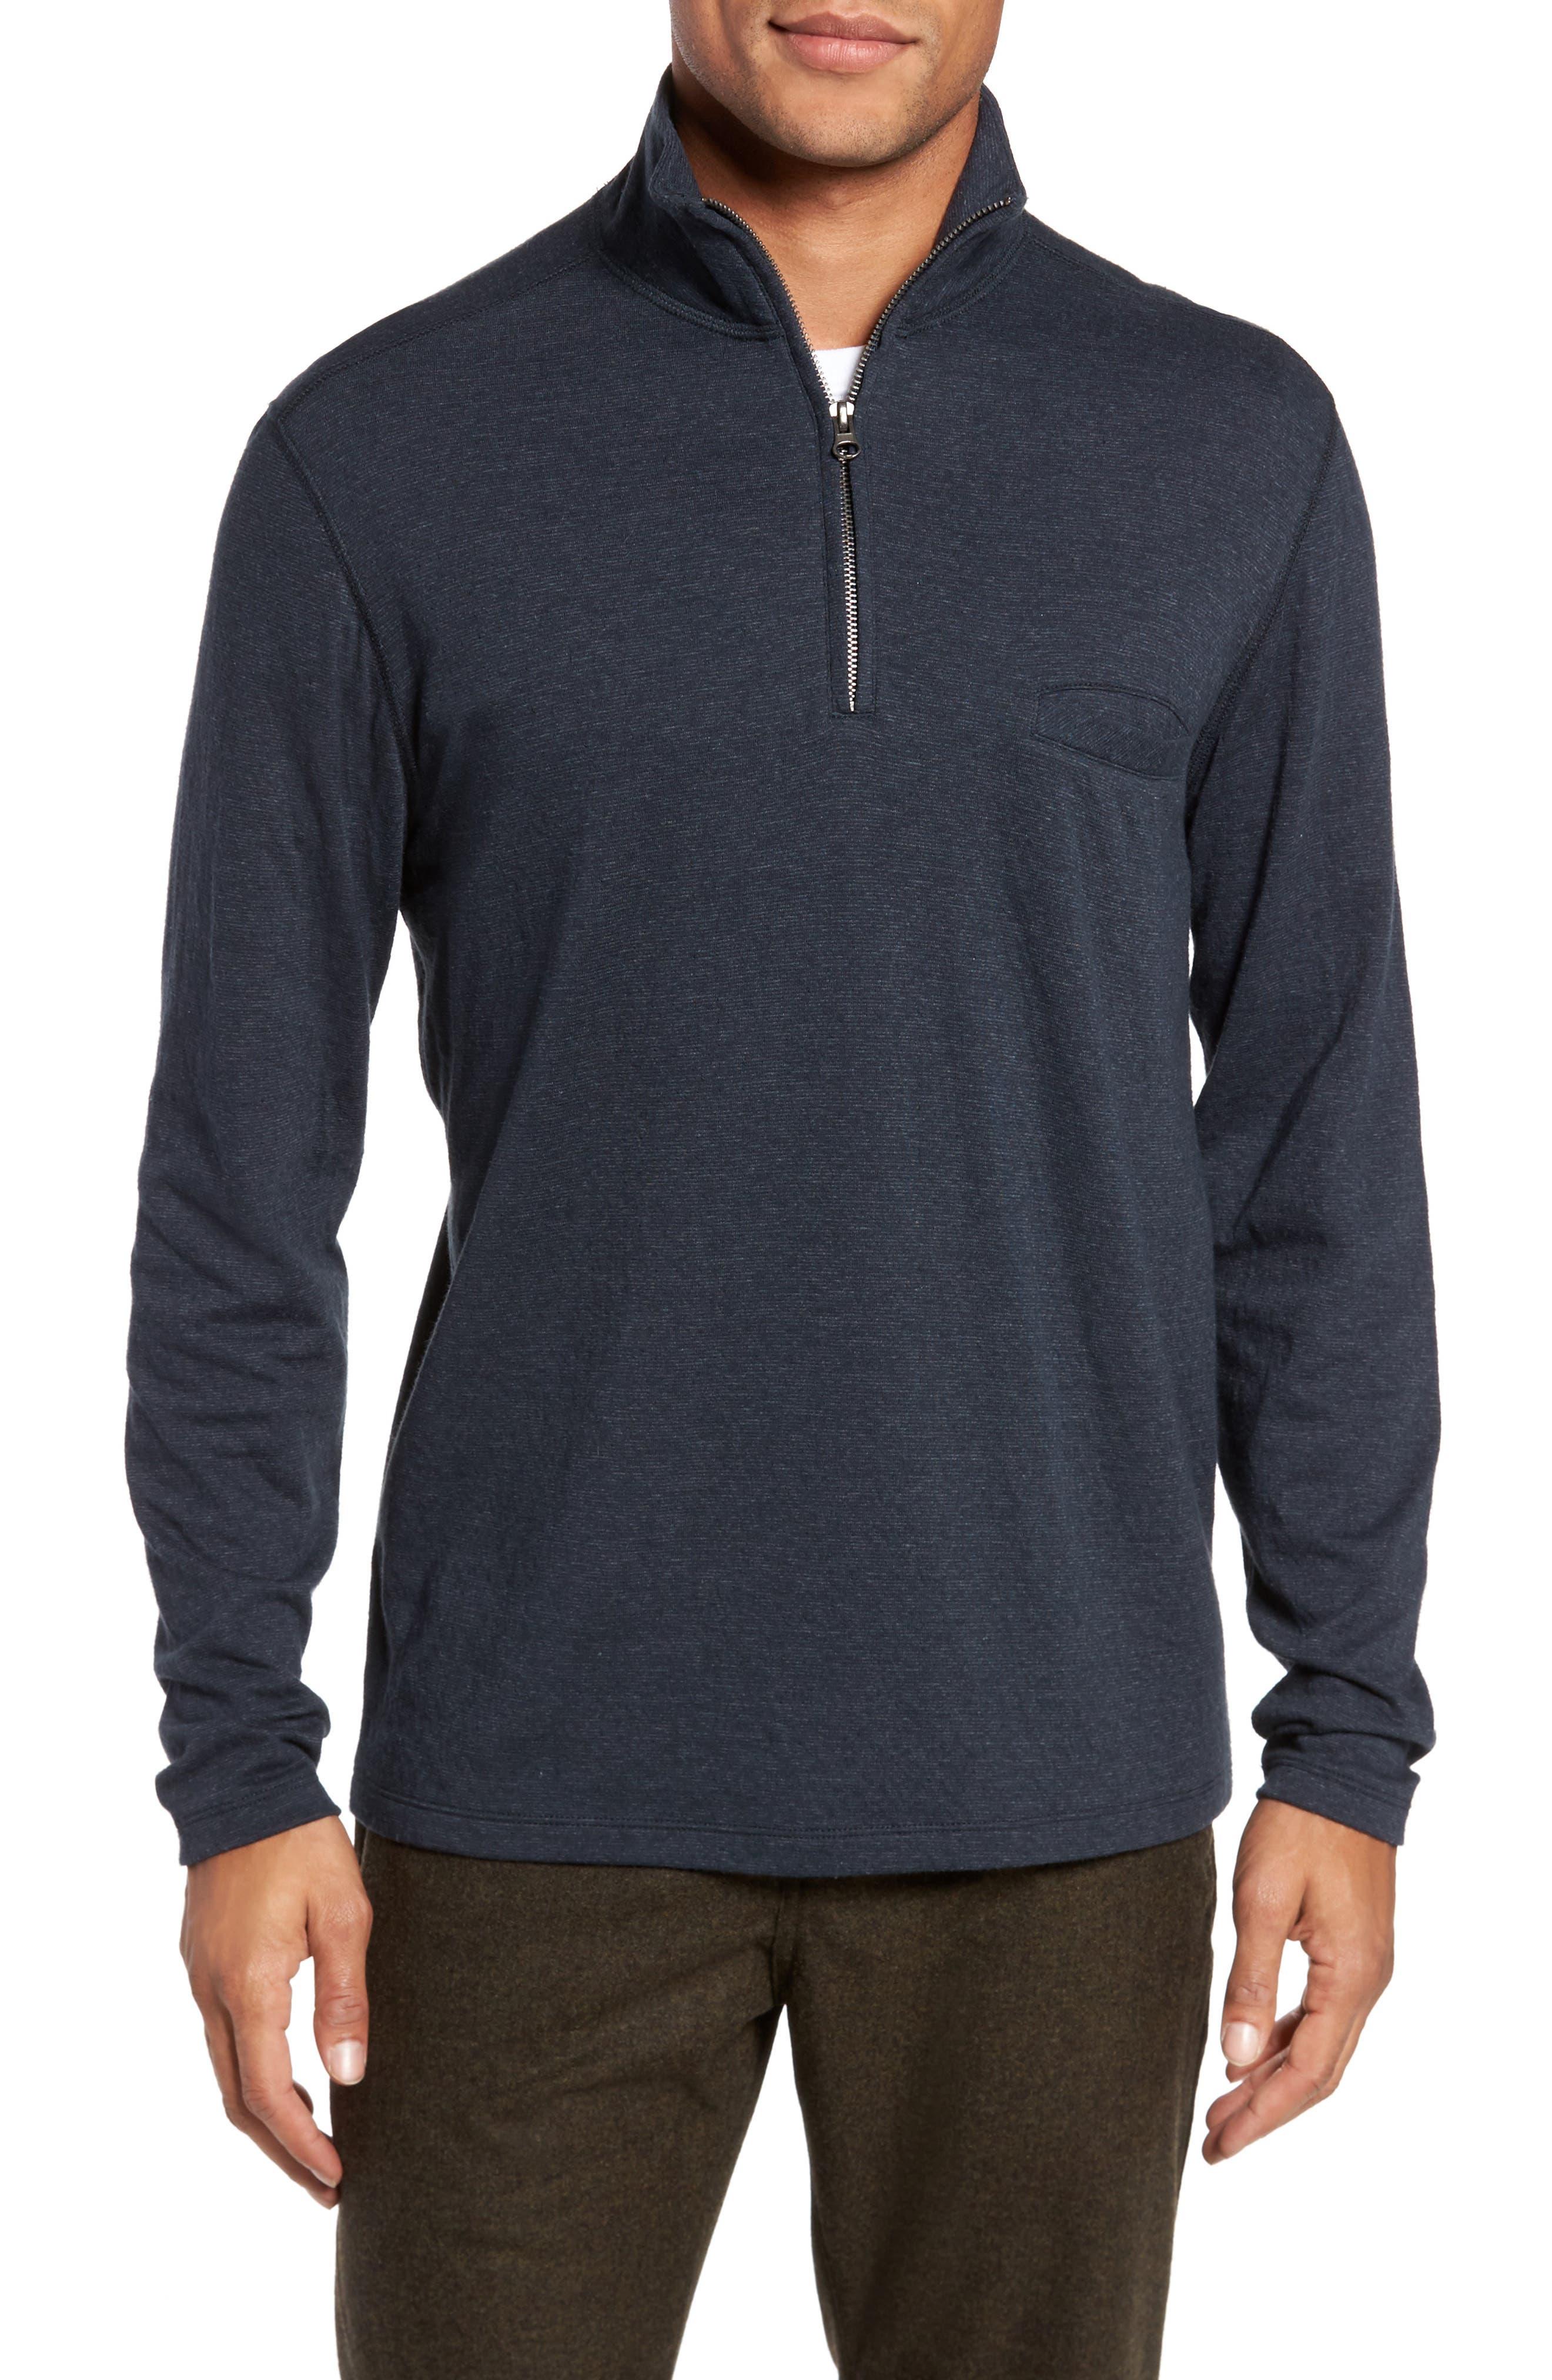 Jordan Quarter Zip Pullover,                             Main thumbnail 1, color,                             Carbon Blue